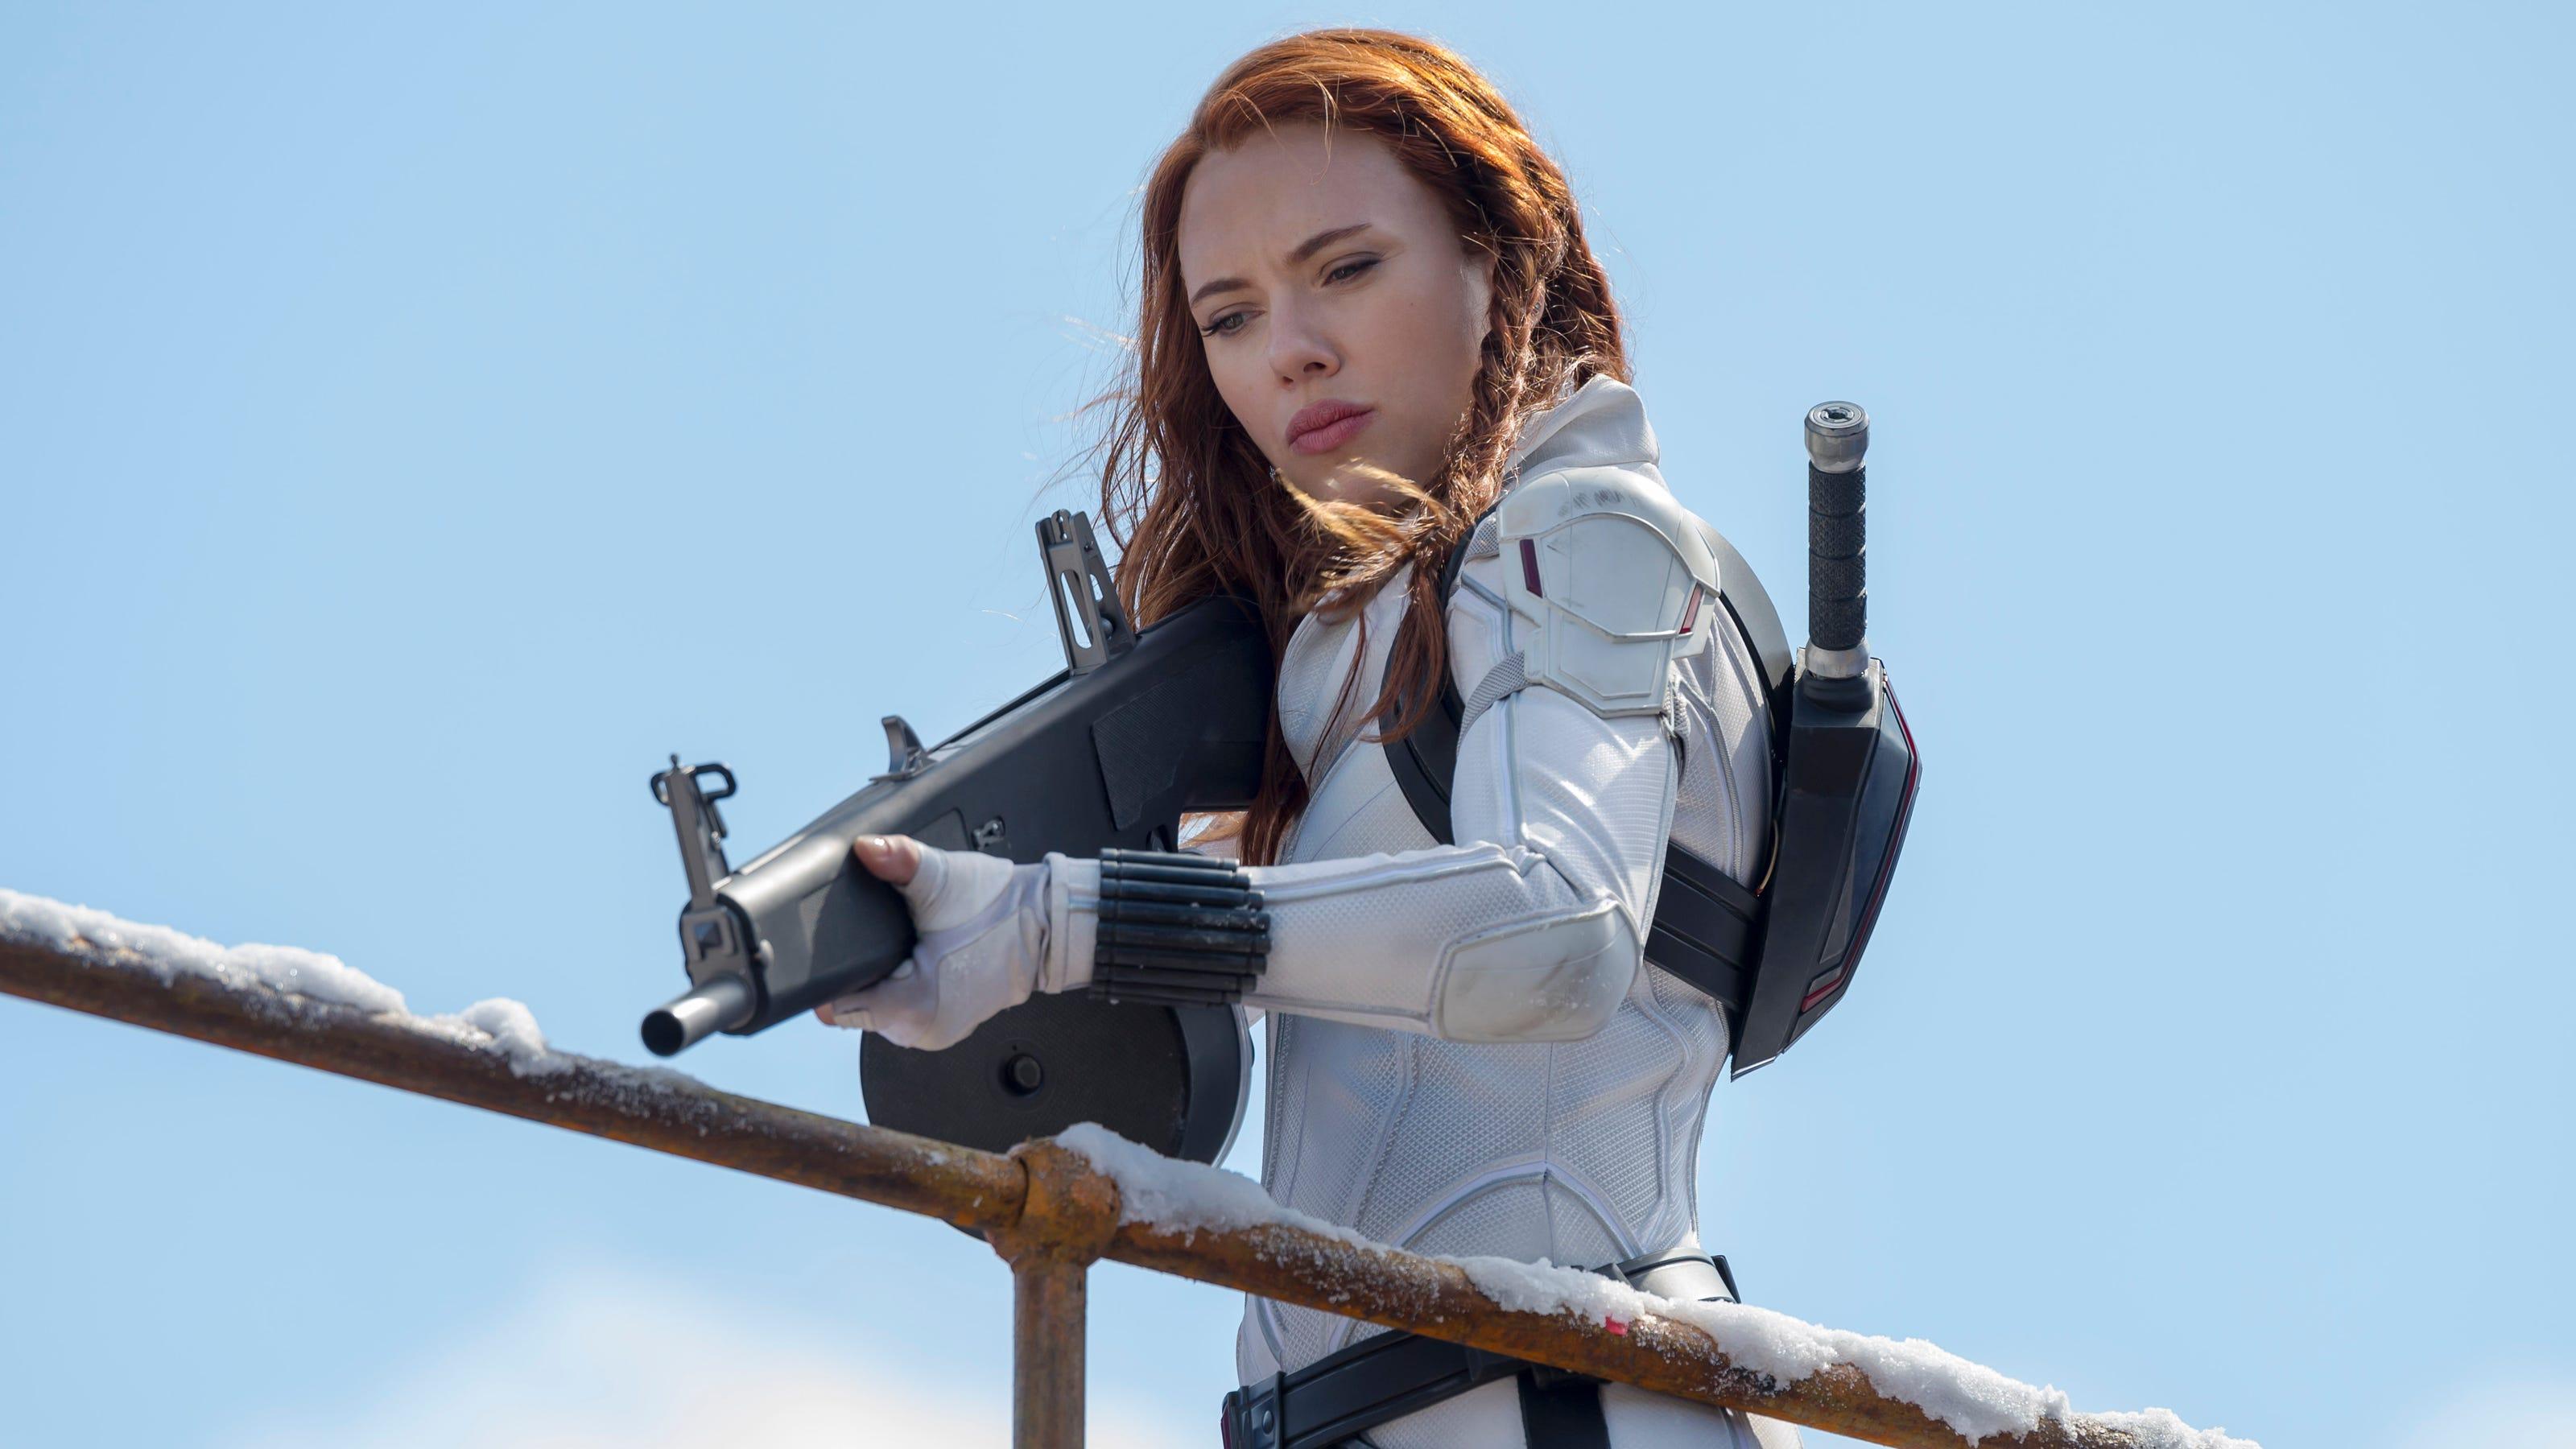 Scarlett Johansson sues over 'Black Widow' streaming release, Disney calls lawsuit 'callous'